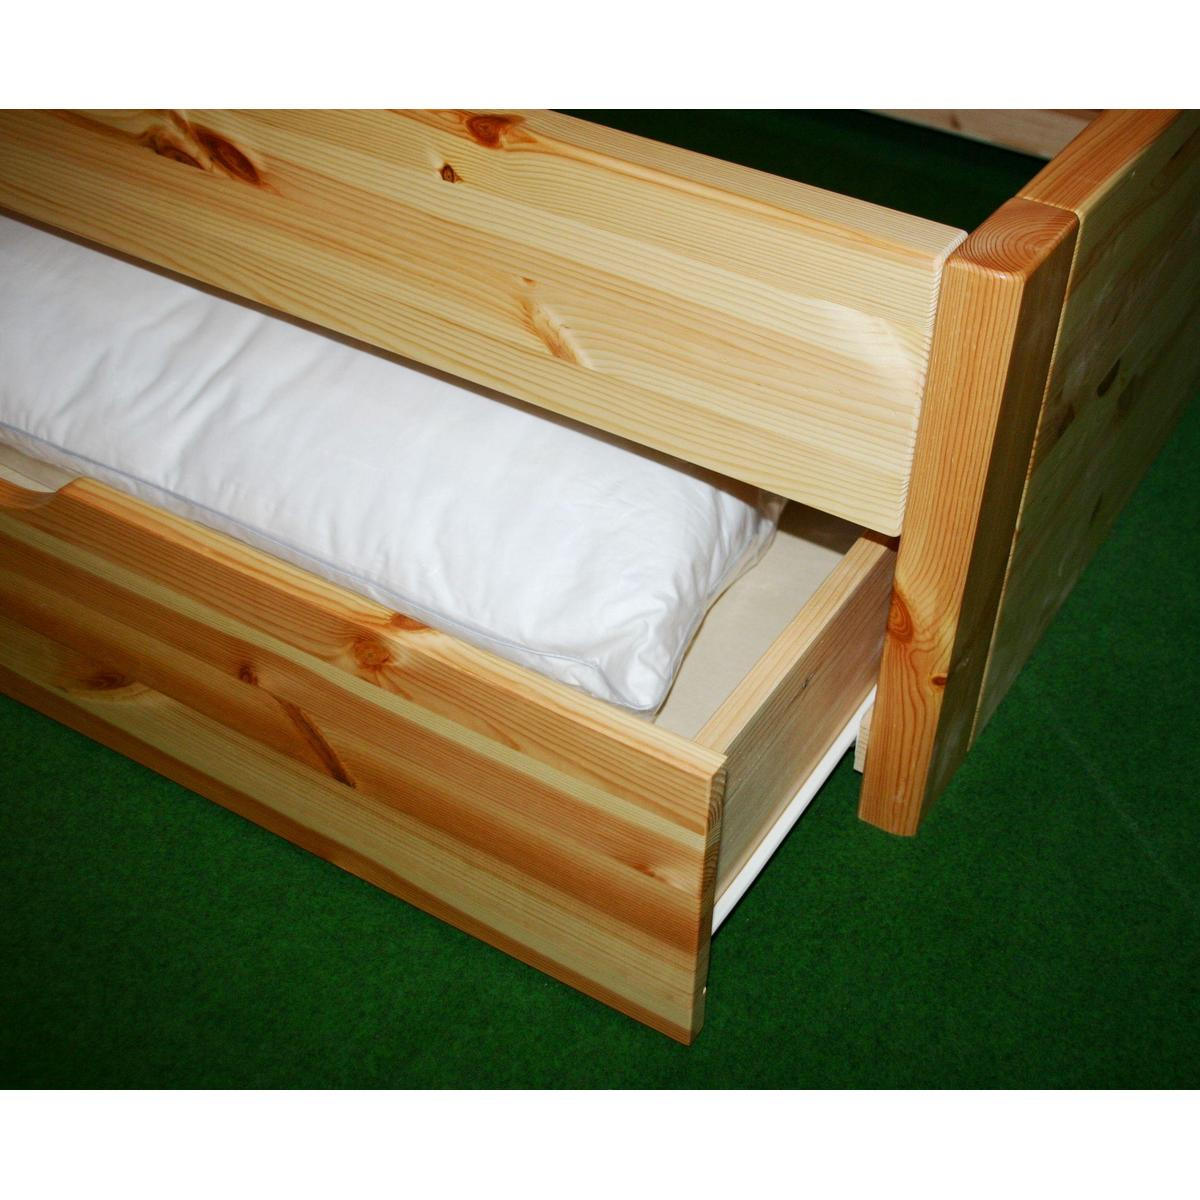 Funktionsbett 180x200  Vollholzbett Bett mit schubladen Kiefer massiv weiss lasiert ...